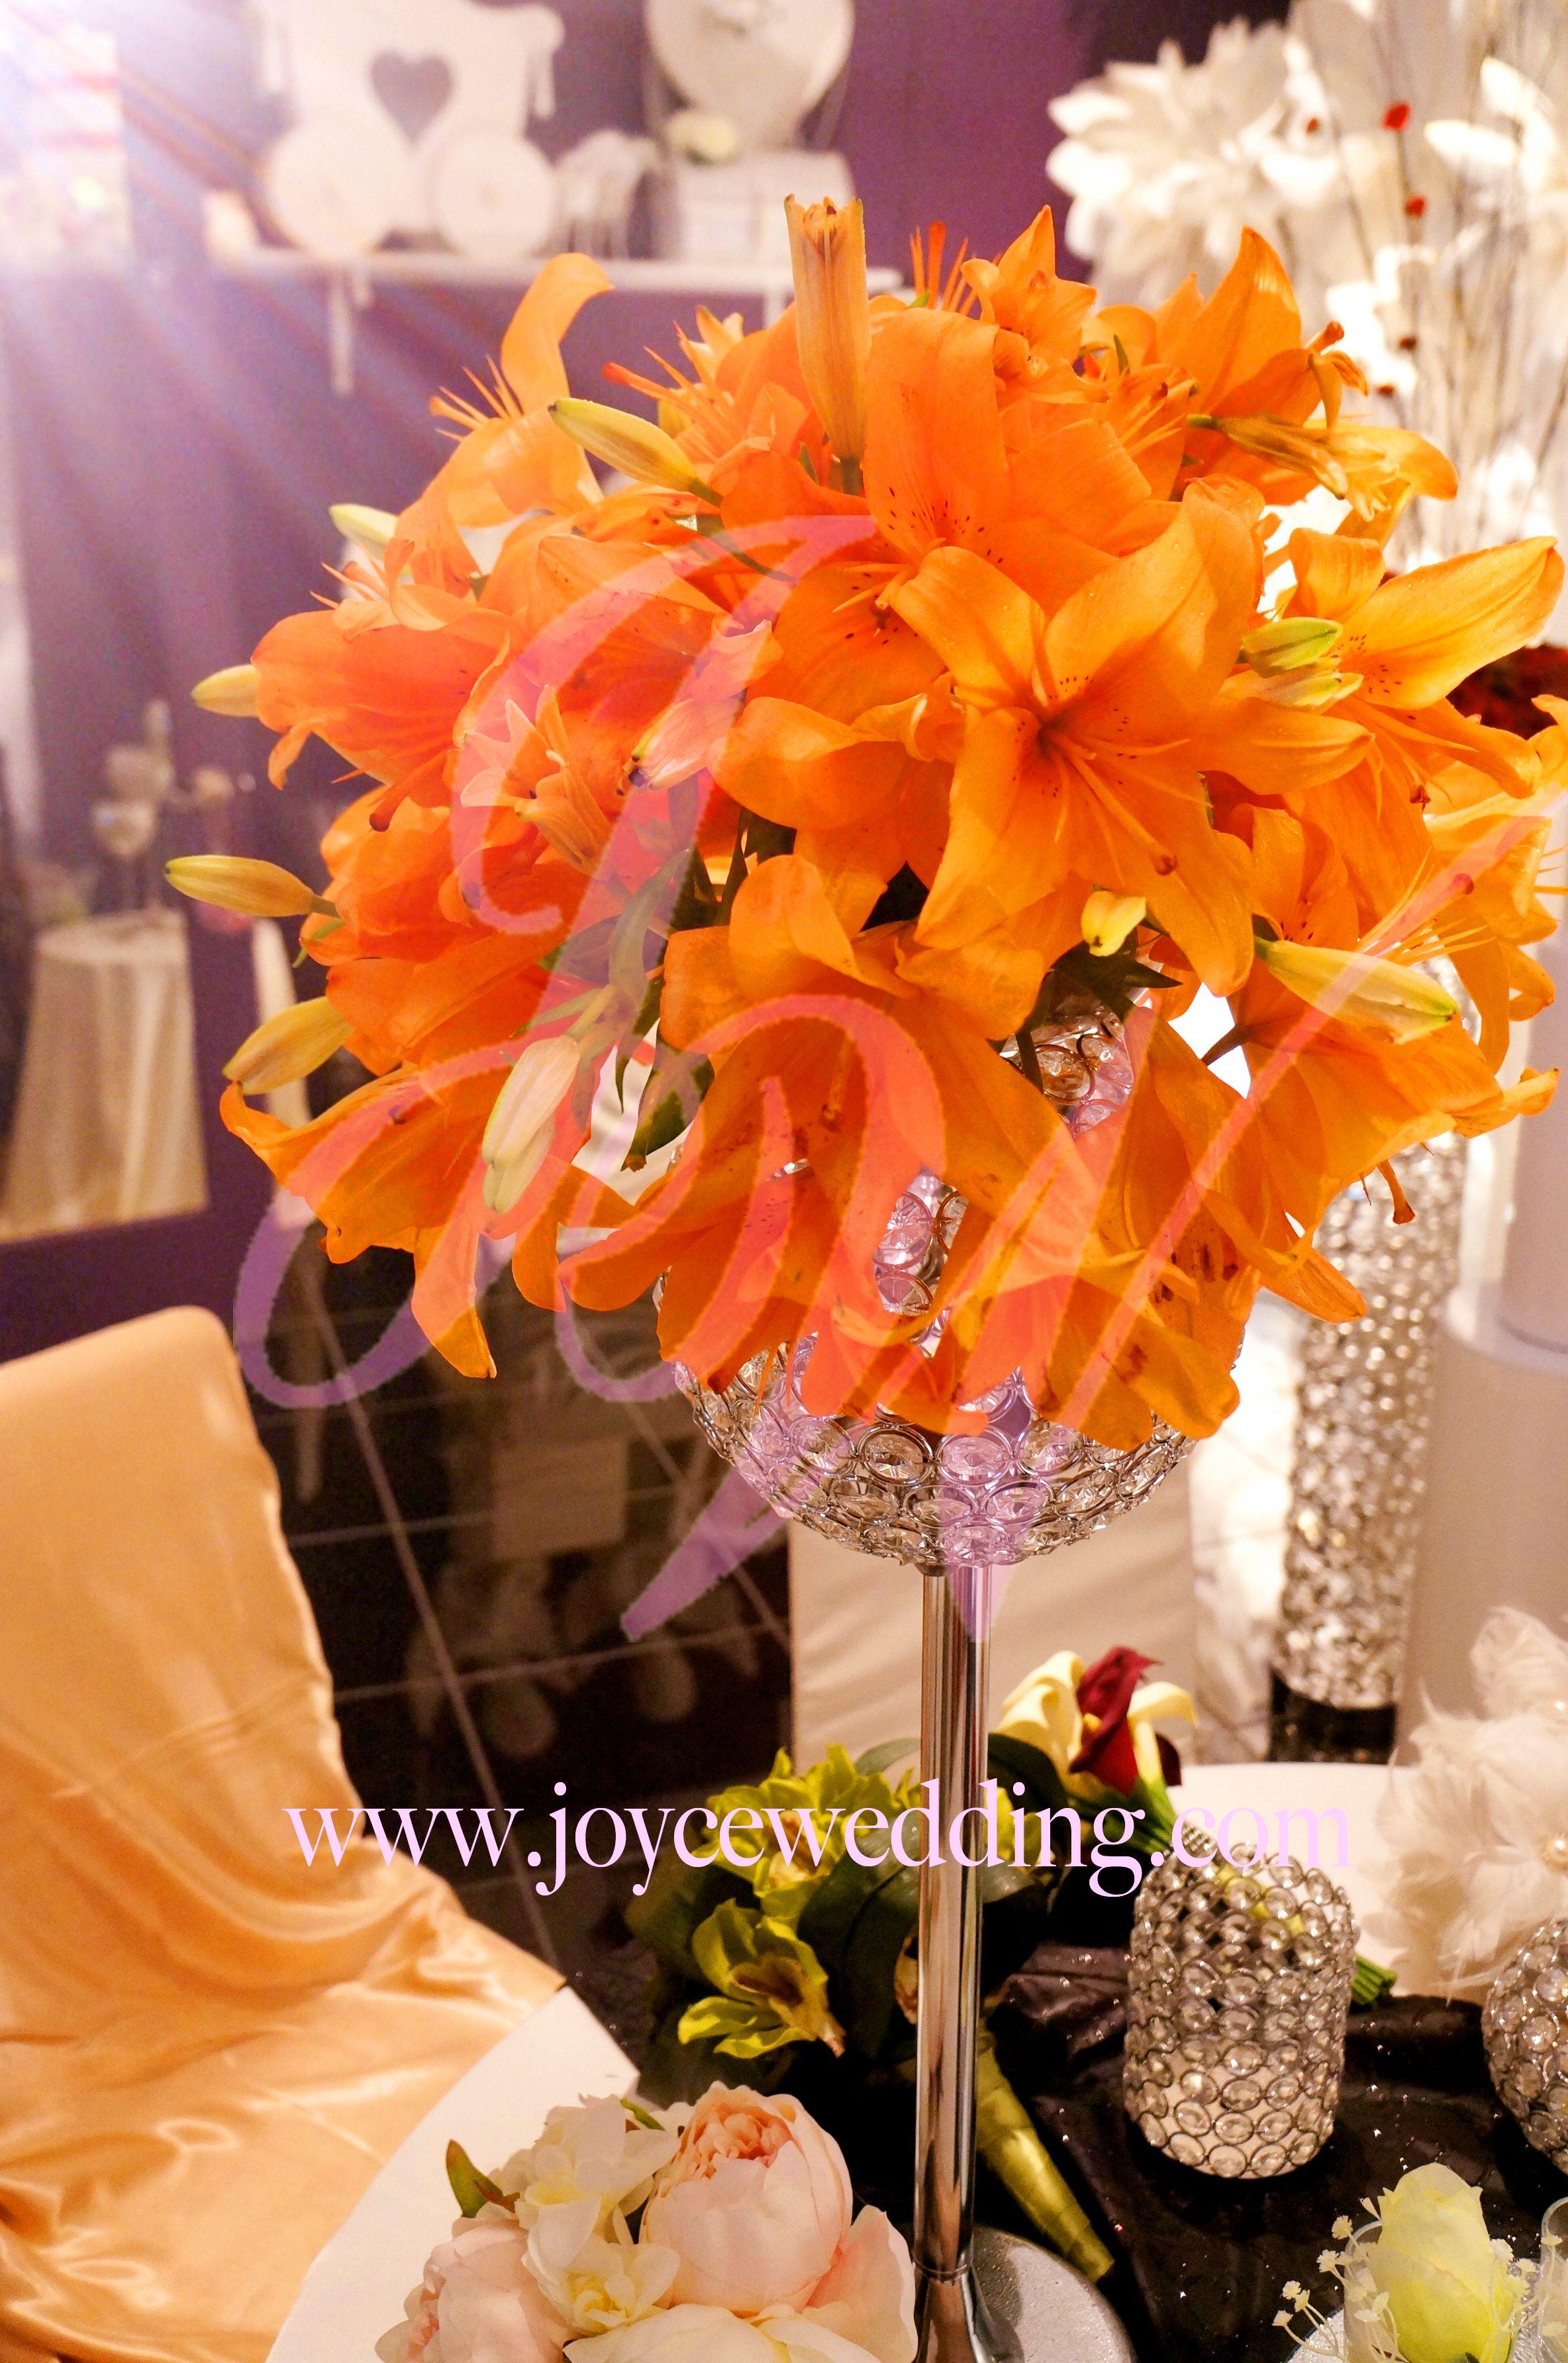 Wedding centerpieces asian theme images wedding dress decoration orange asian lily centerpiece asian lilies lily centerpieces orange asian lily centerpiece junglespirit images junglespirit Image collections